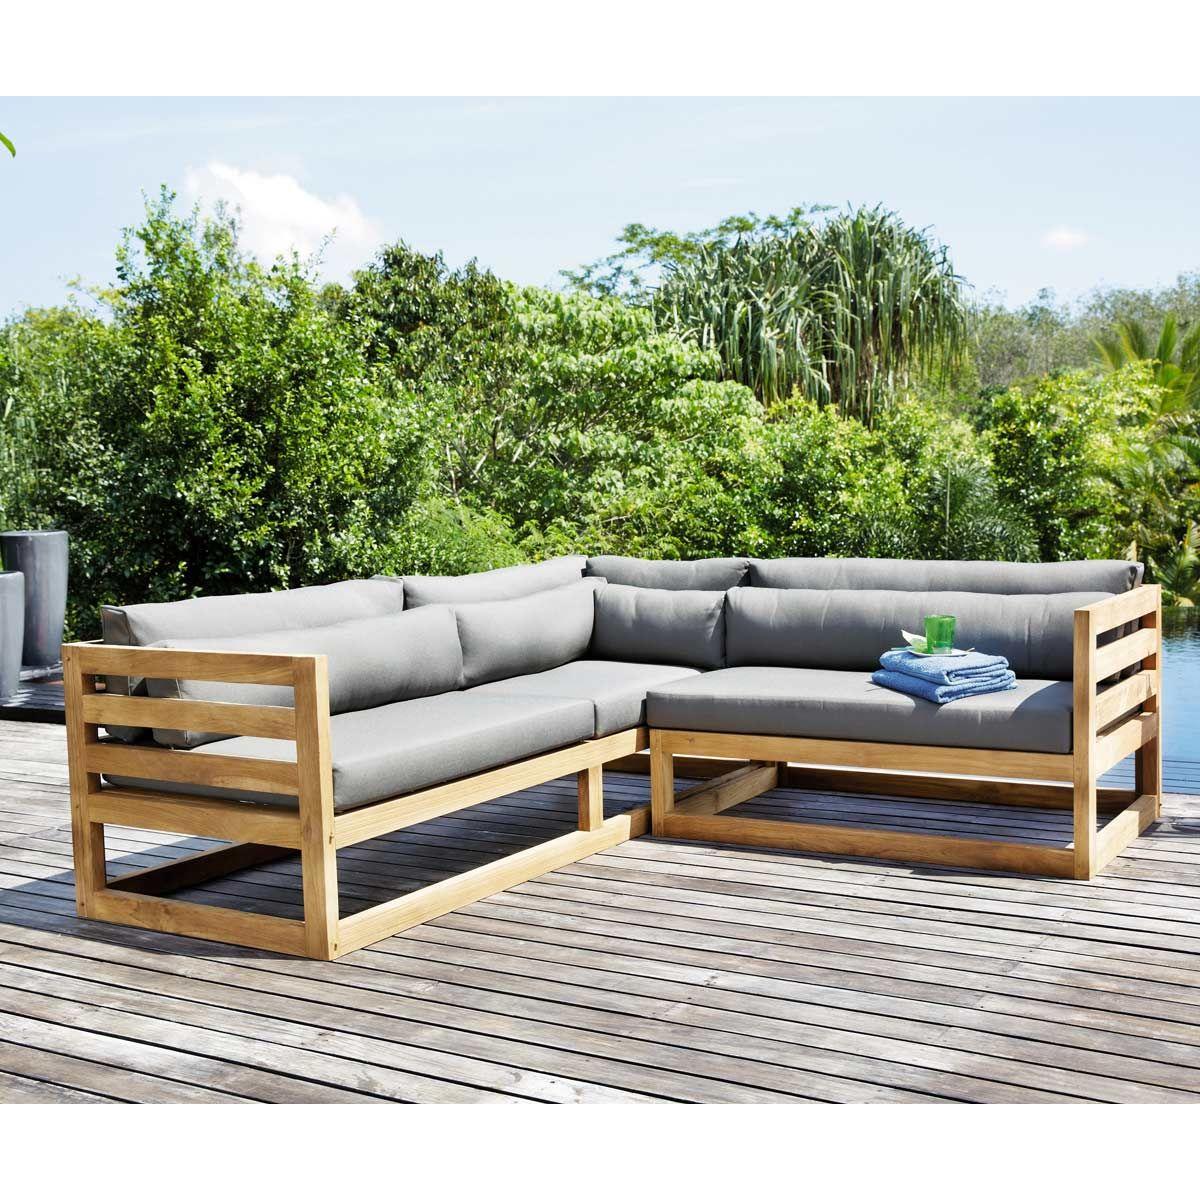 3 4 seater teak garden corner sofa cyclades gardens. Black Bedroom Furniture Sets. Home Design Ideas